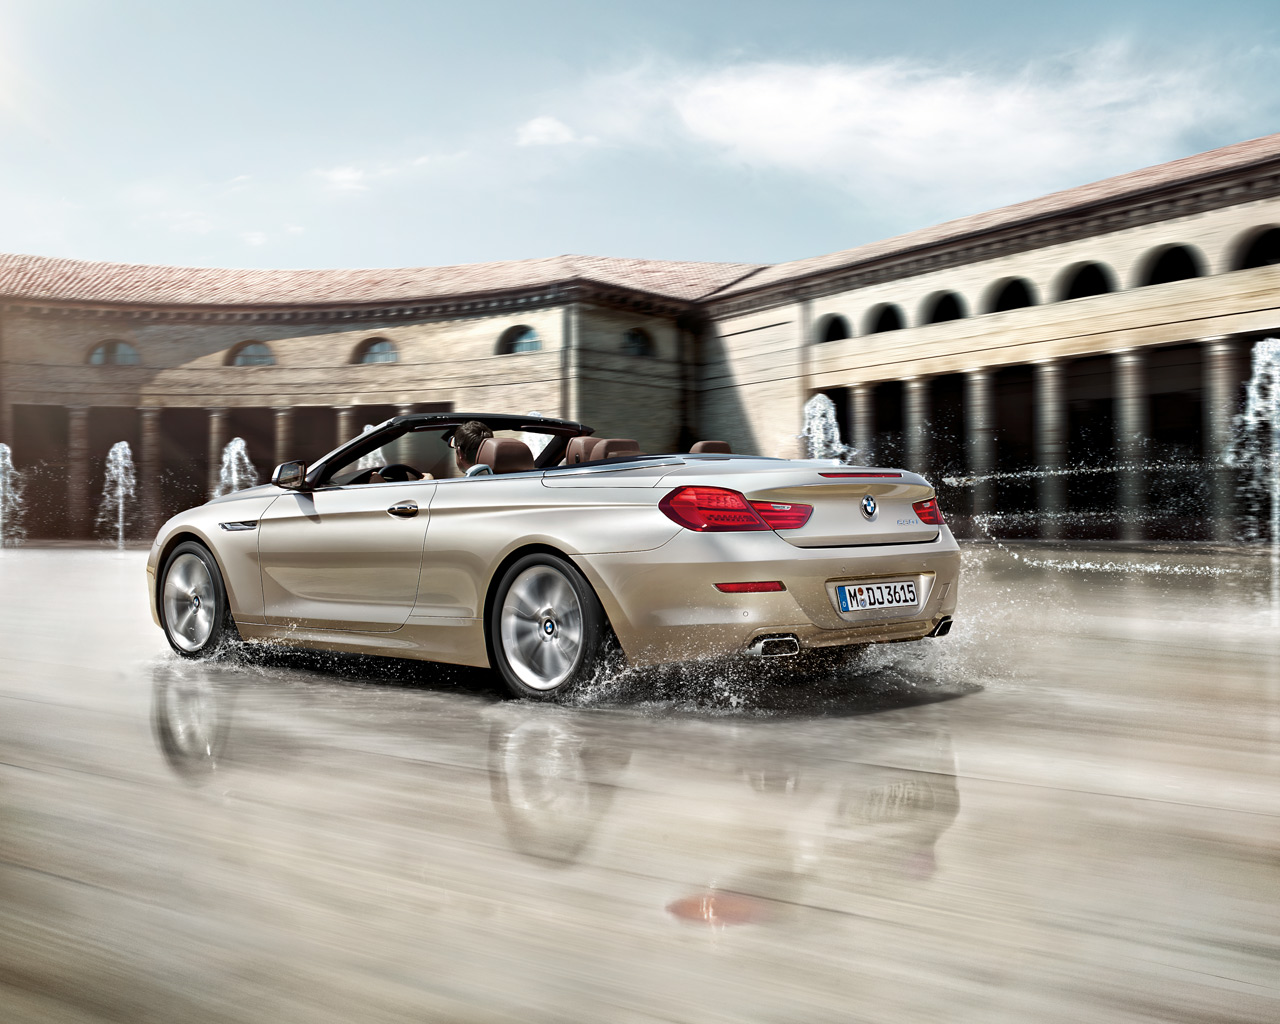 wallpaper-new-bmw-6-series-convertible-1